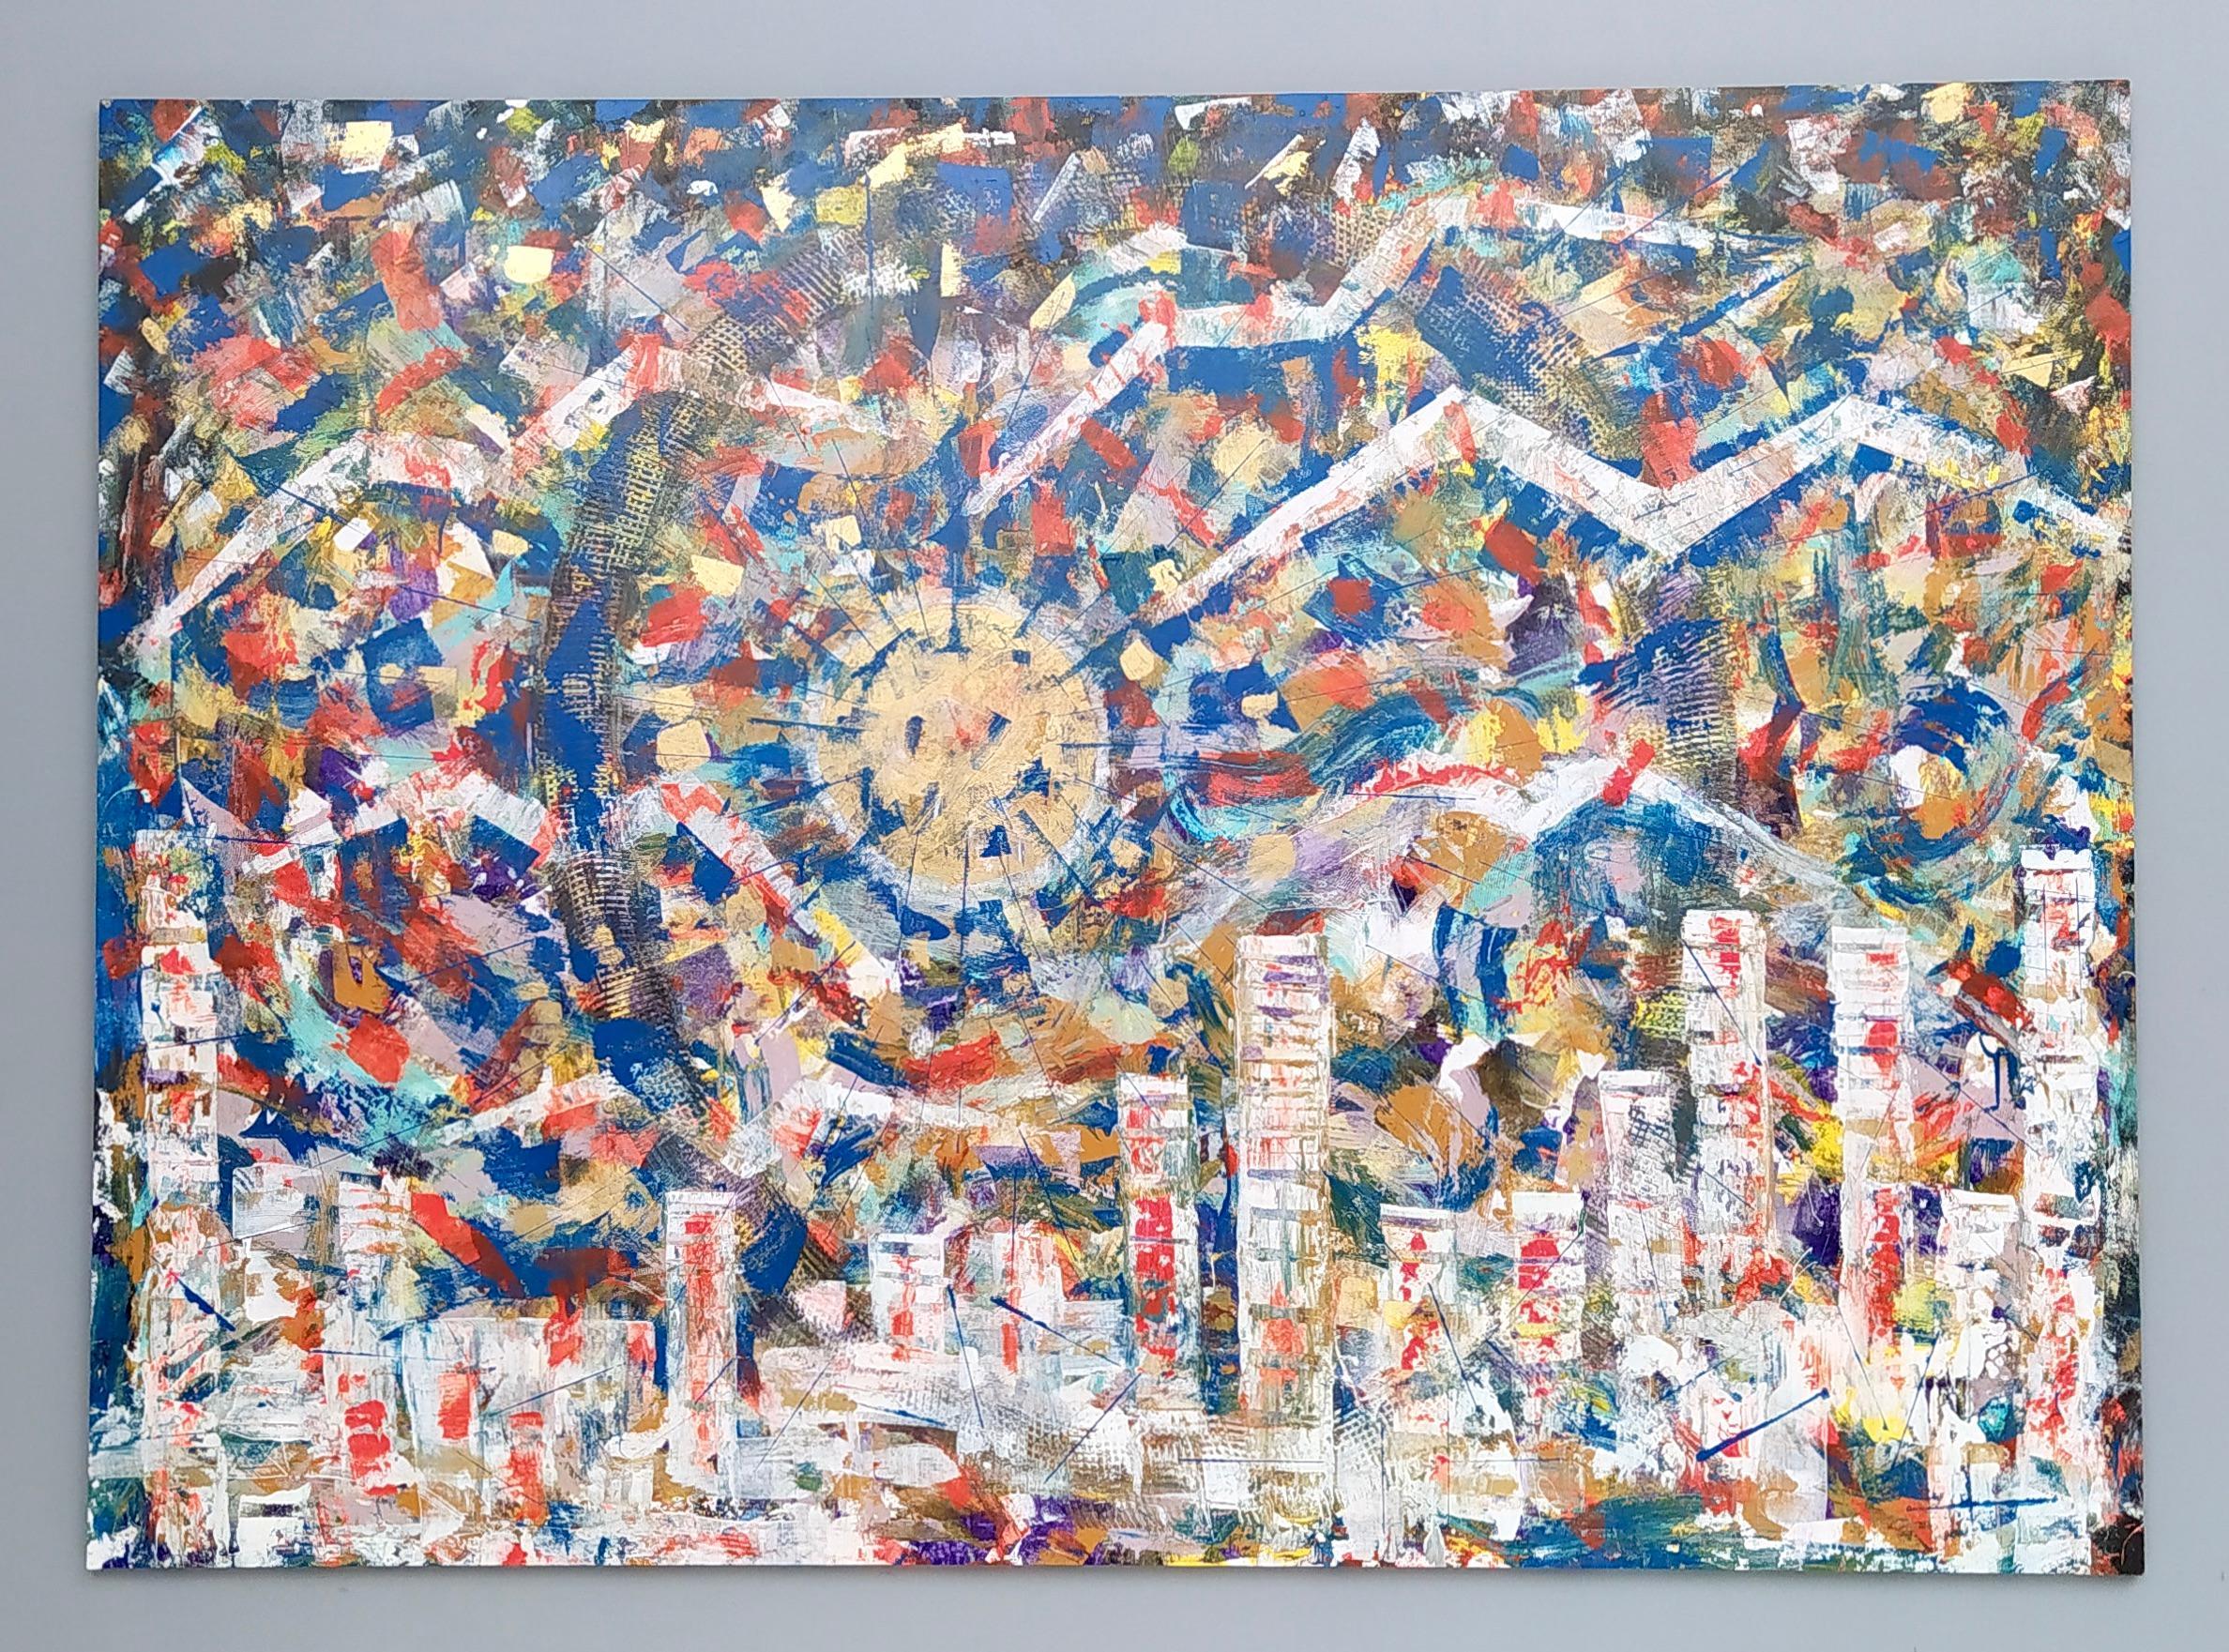 """Paesaggio urbano"" by Enzio Wenk, 2020 - Acrylic on Canvas, Neo-Expressionism"